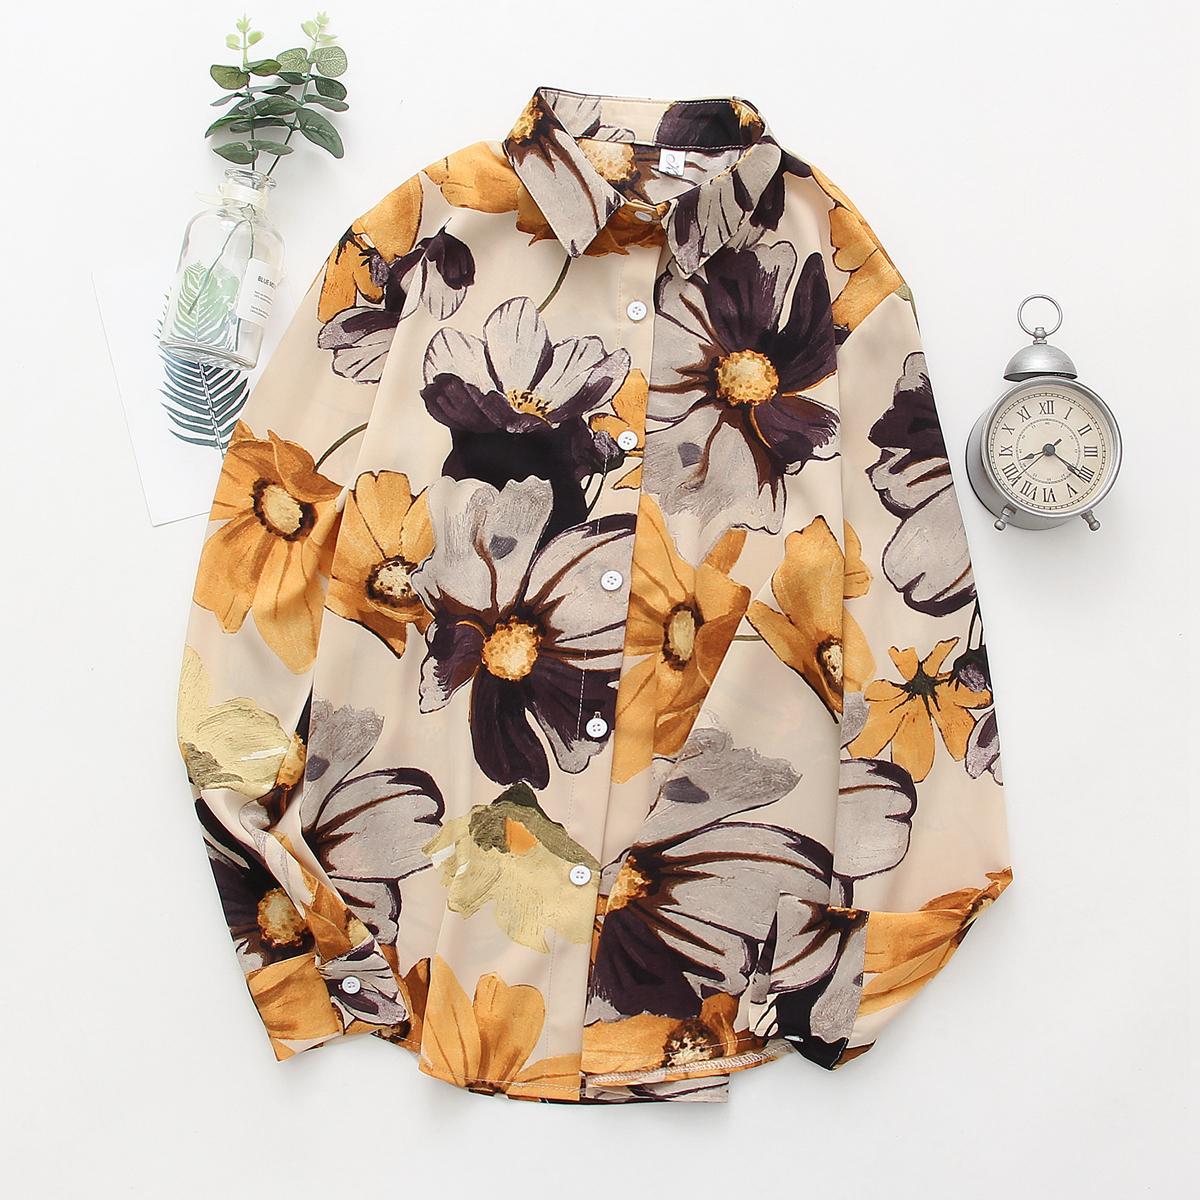 2020 Summer Hawaii Floral Shirts Women Blouses Long Sleeve Shirt Camisas Femininas Female Tops Fashion Blusas Mujer